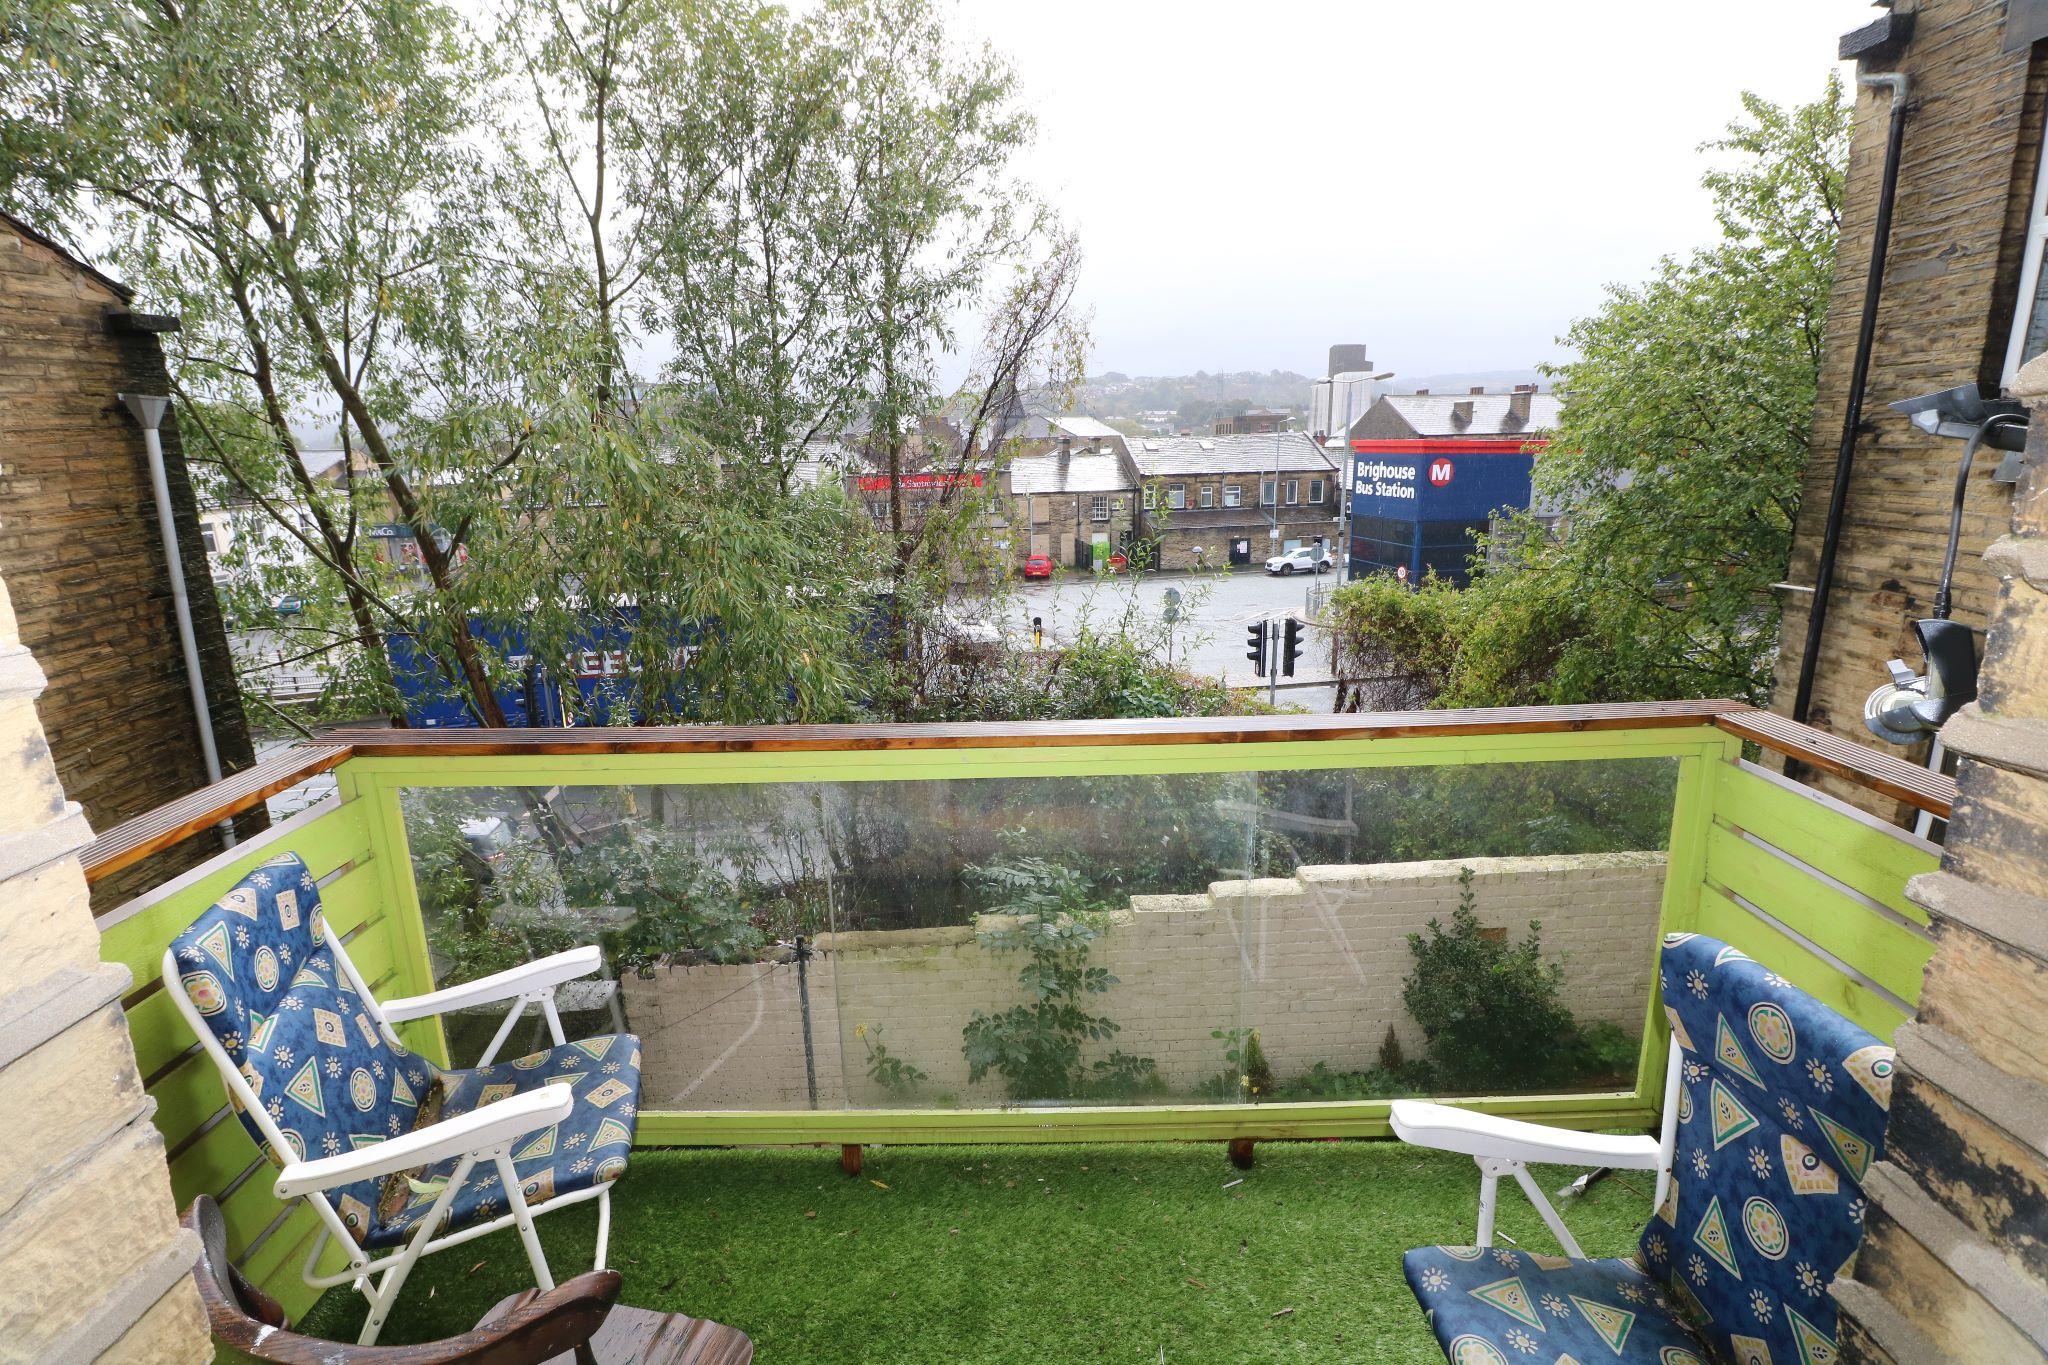 4 Bedroom Town House For Sale - Juliette Balcony